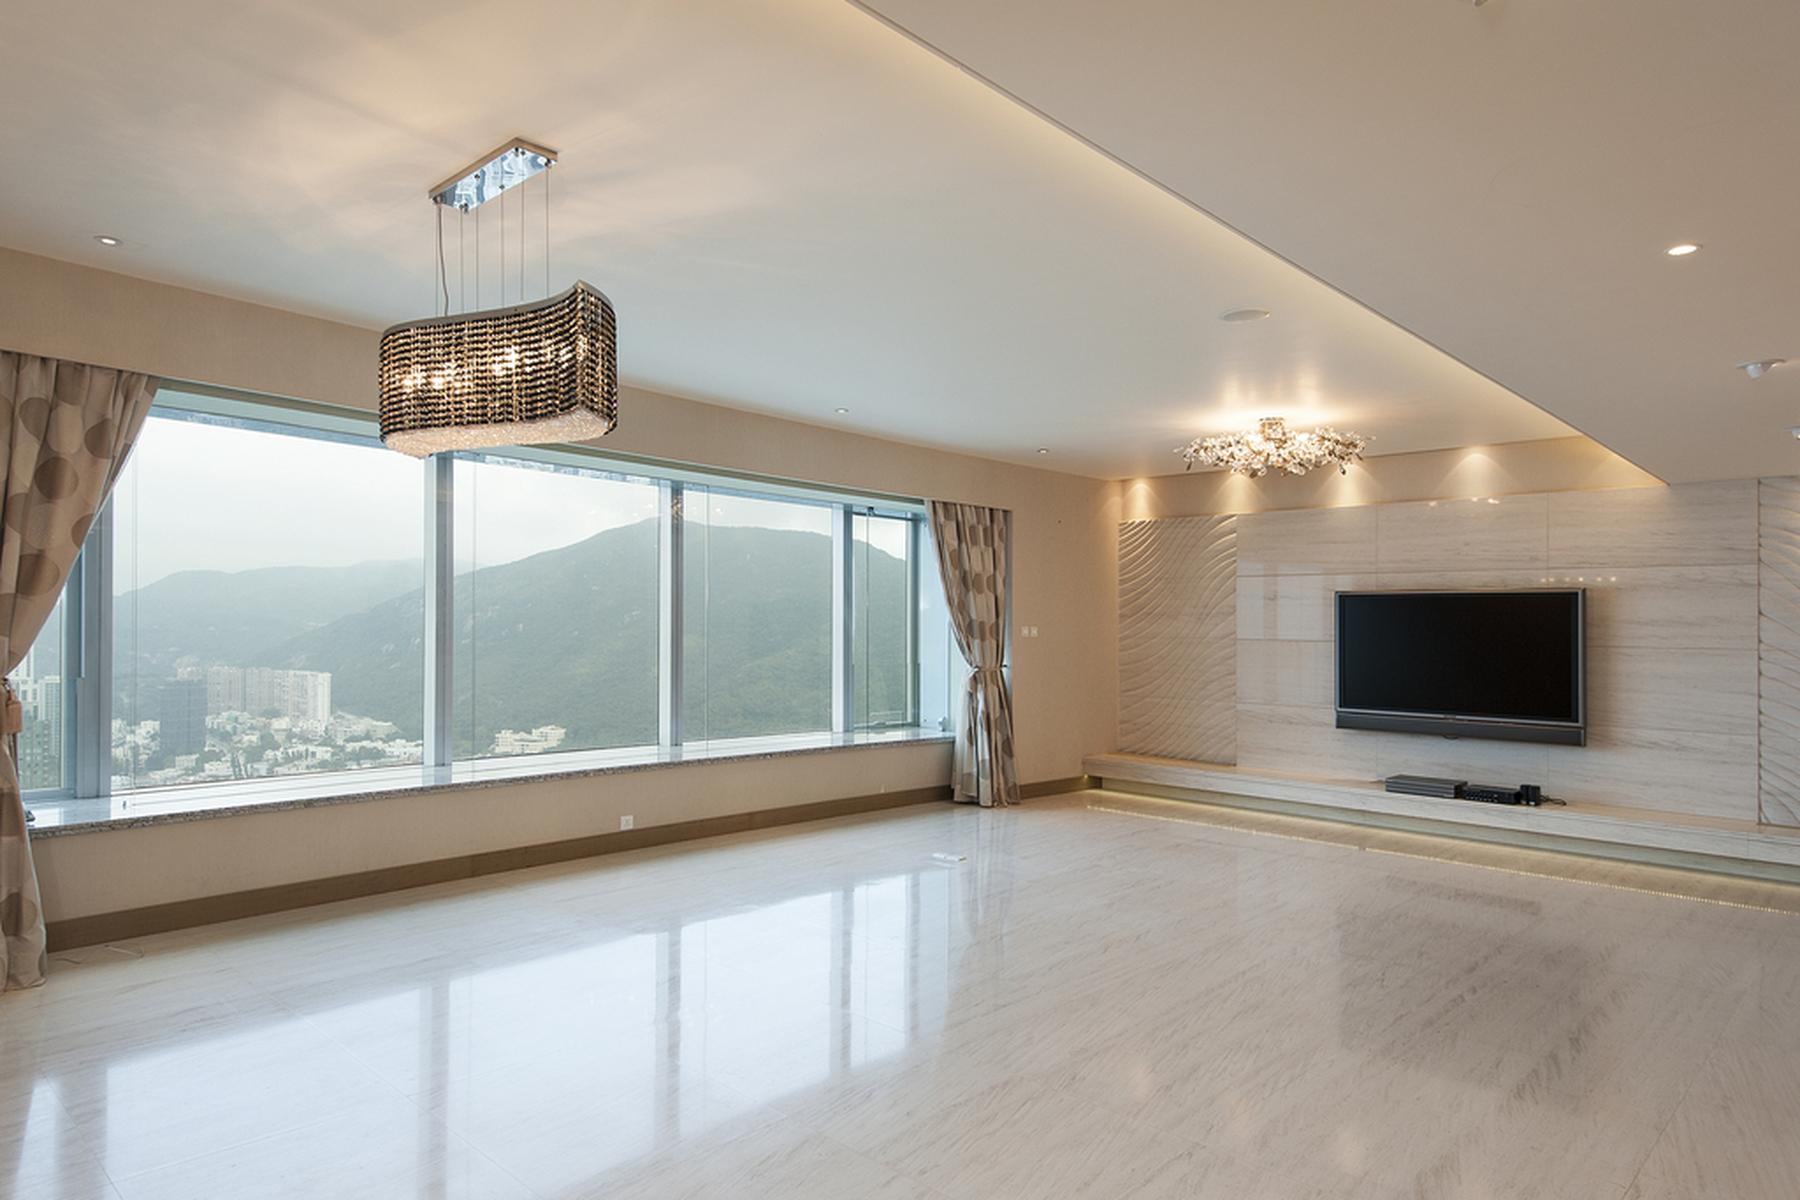 Apartamento para Venda às HighCliff Midlevels East, Hong Kong